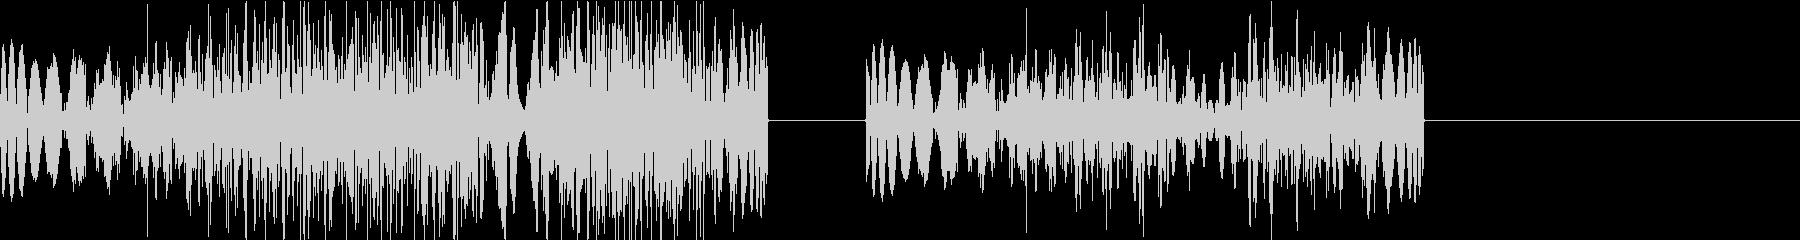 DJプレイ スクラッチ・ノイズ 310の未再生の波形